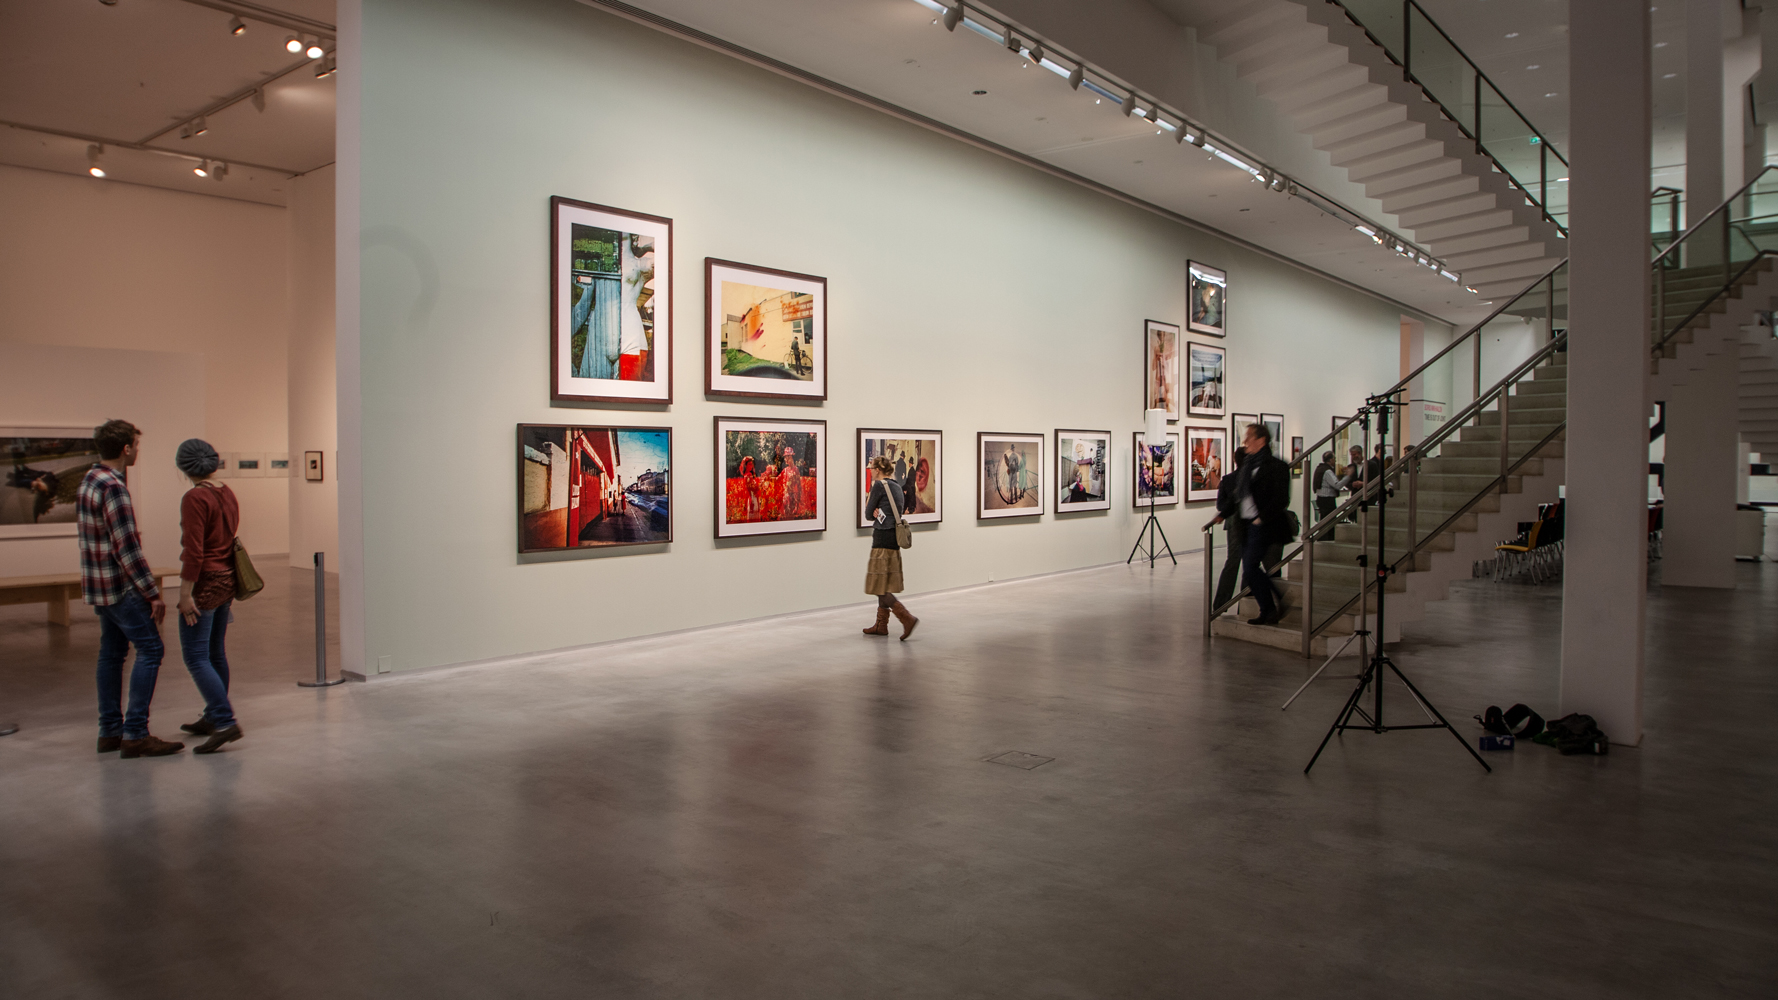 Weitwinkelfotografie Ausstellungsfotografie Berlinische Galerie - Marco van Oel